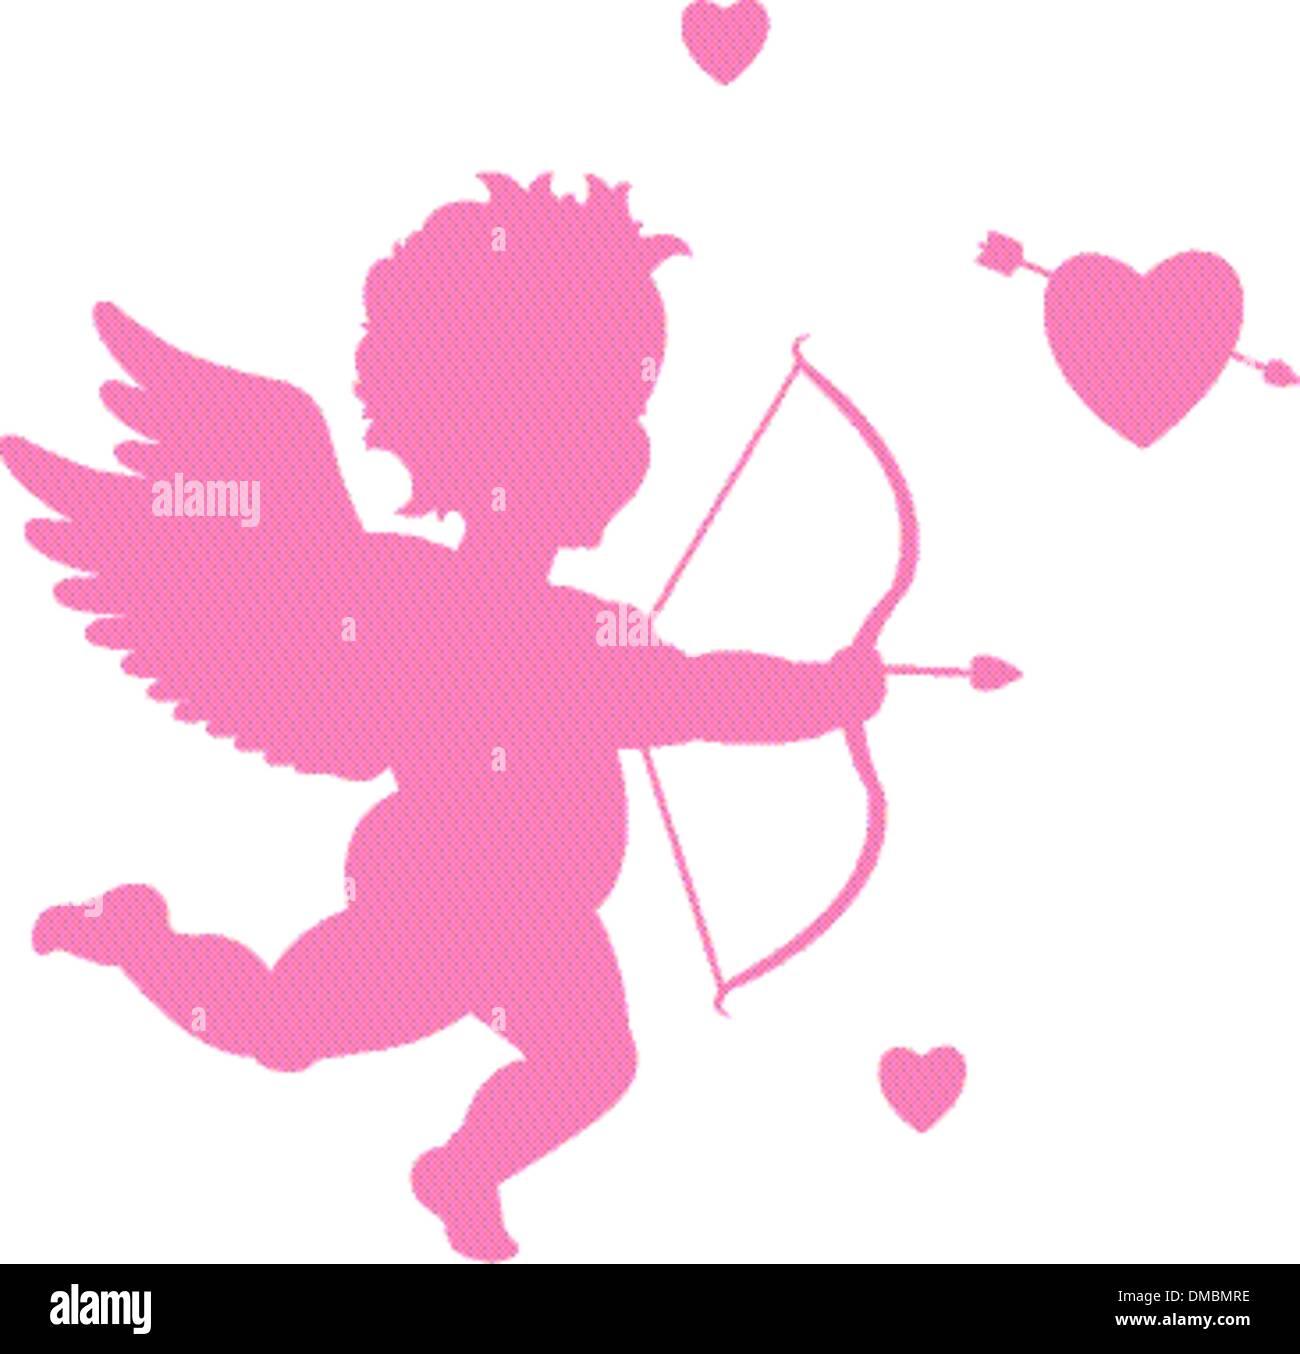 Valentine's day cupid - Stock Image